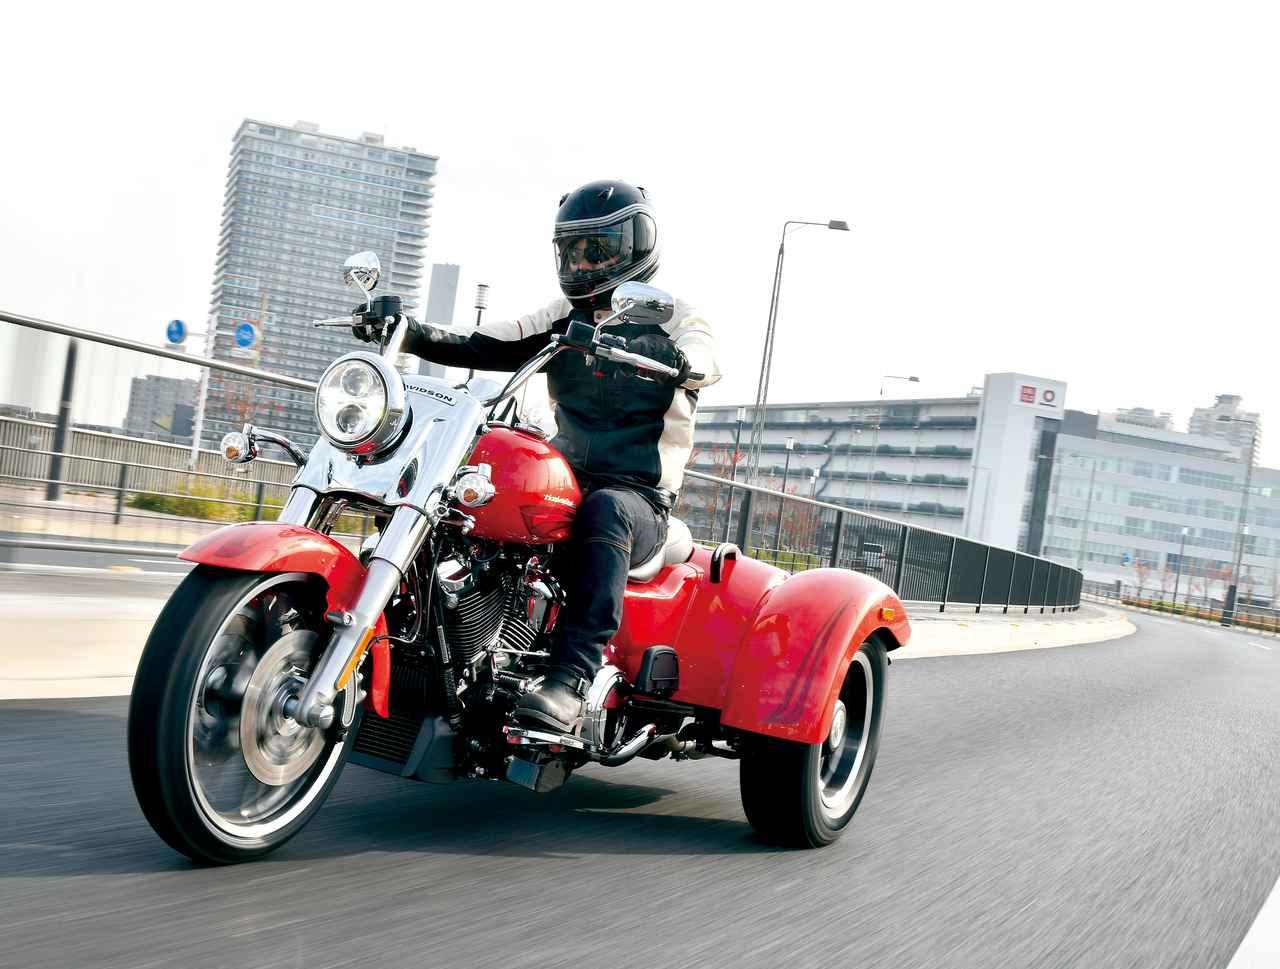 Images : 1番目の画像 - HARLEY-DAVIDSON FREEWHEELER[FLRT] - webオートバイ